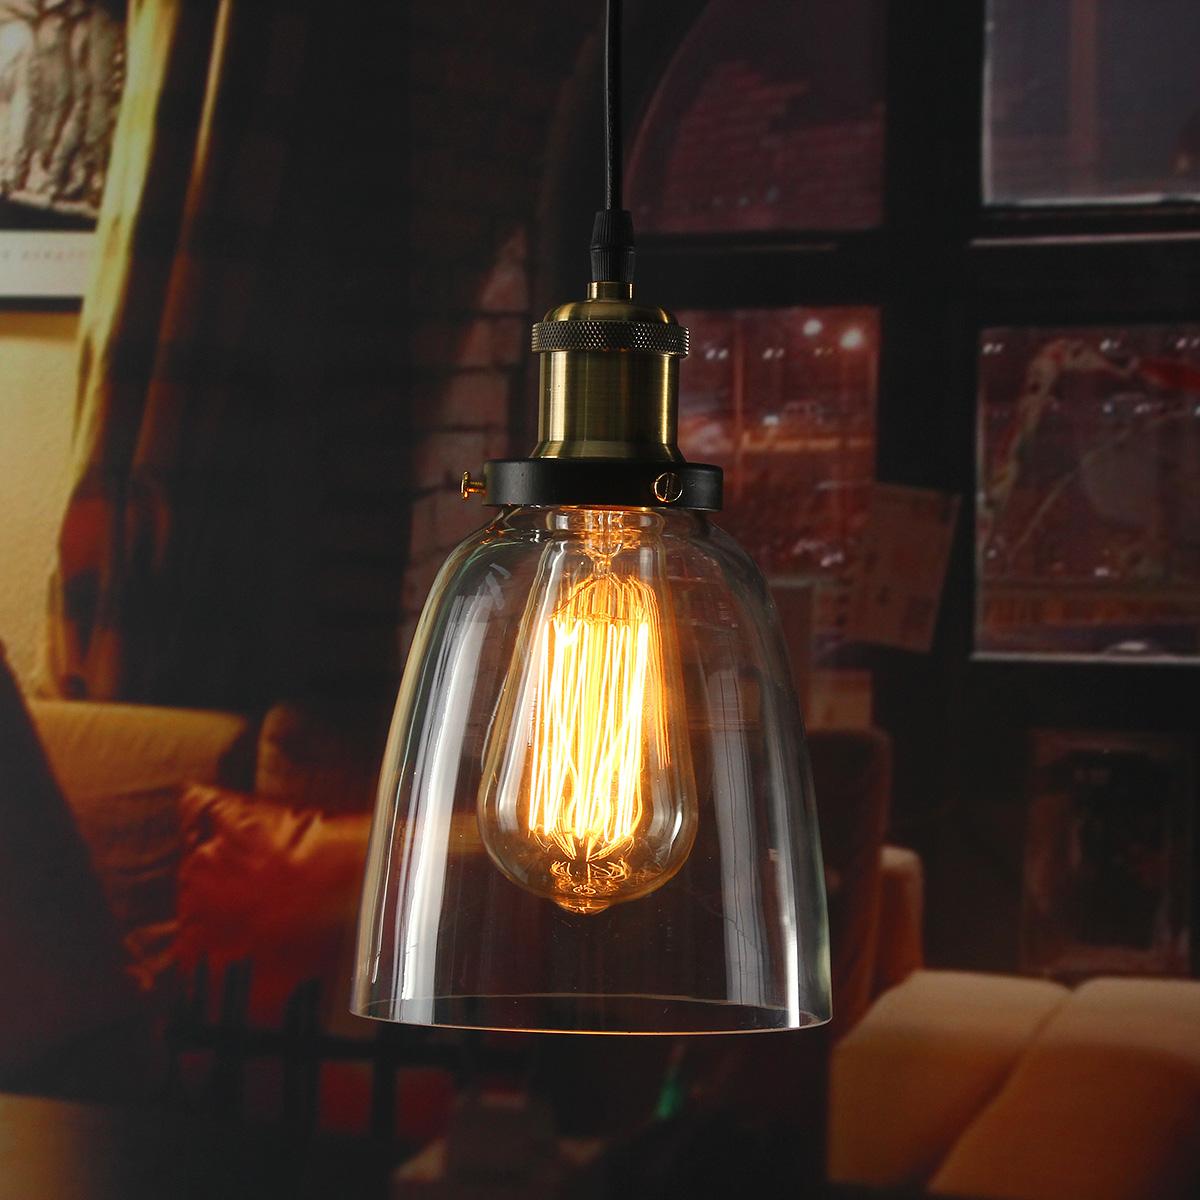 u e27 m tal r tro suspensions luminaire vintage industrielle verre 20 20 achat vente u e27. Black Bedroom Furniture Sets. Home Design Ideas